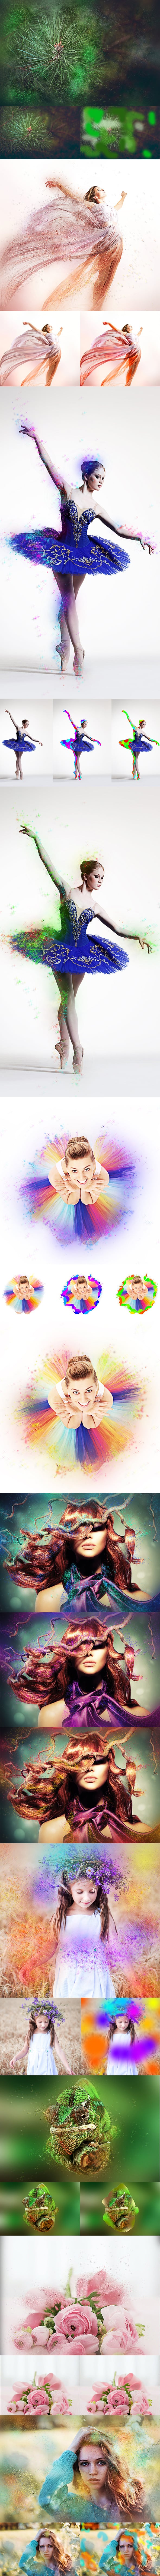 63 VSCO Photoshop Actions: Artistic Actions Bundle - just $9 - 21